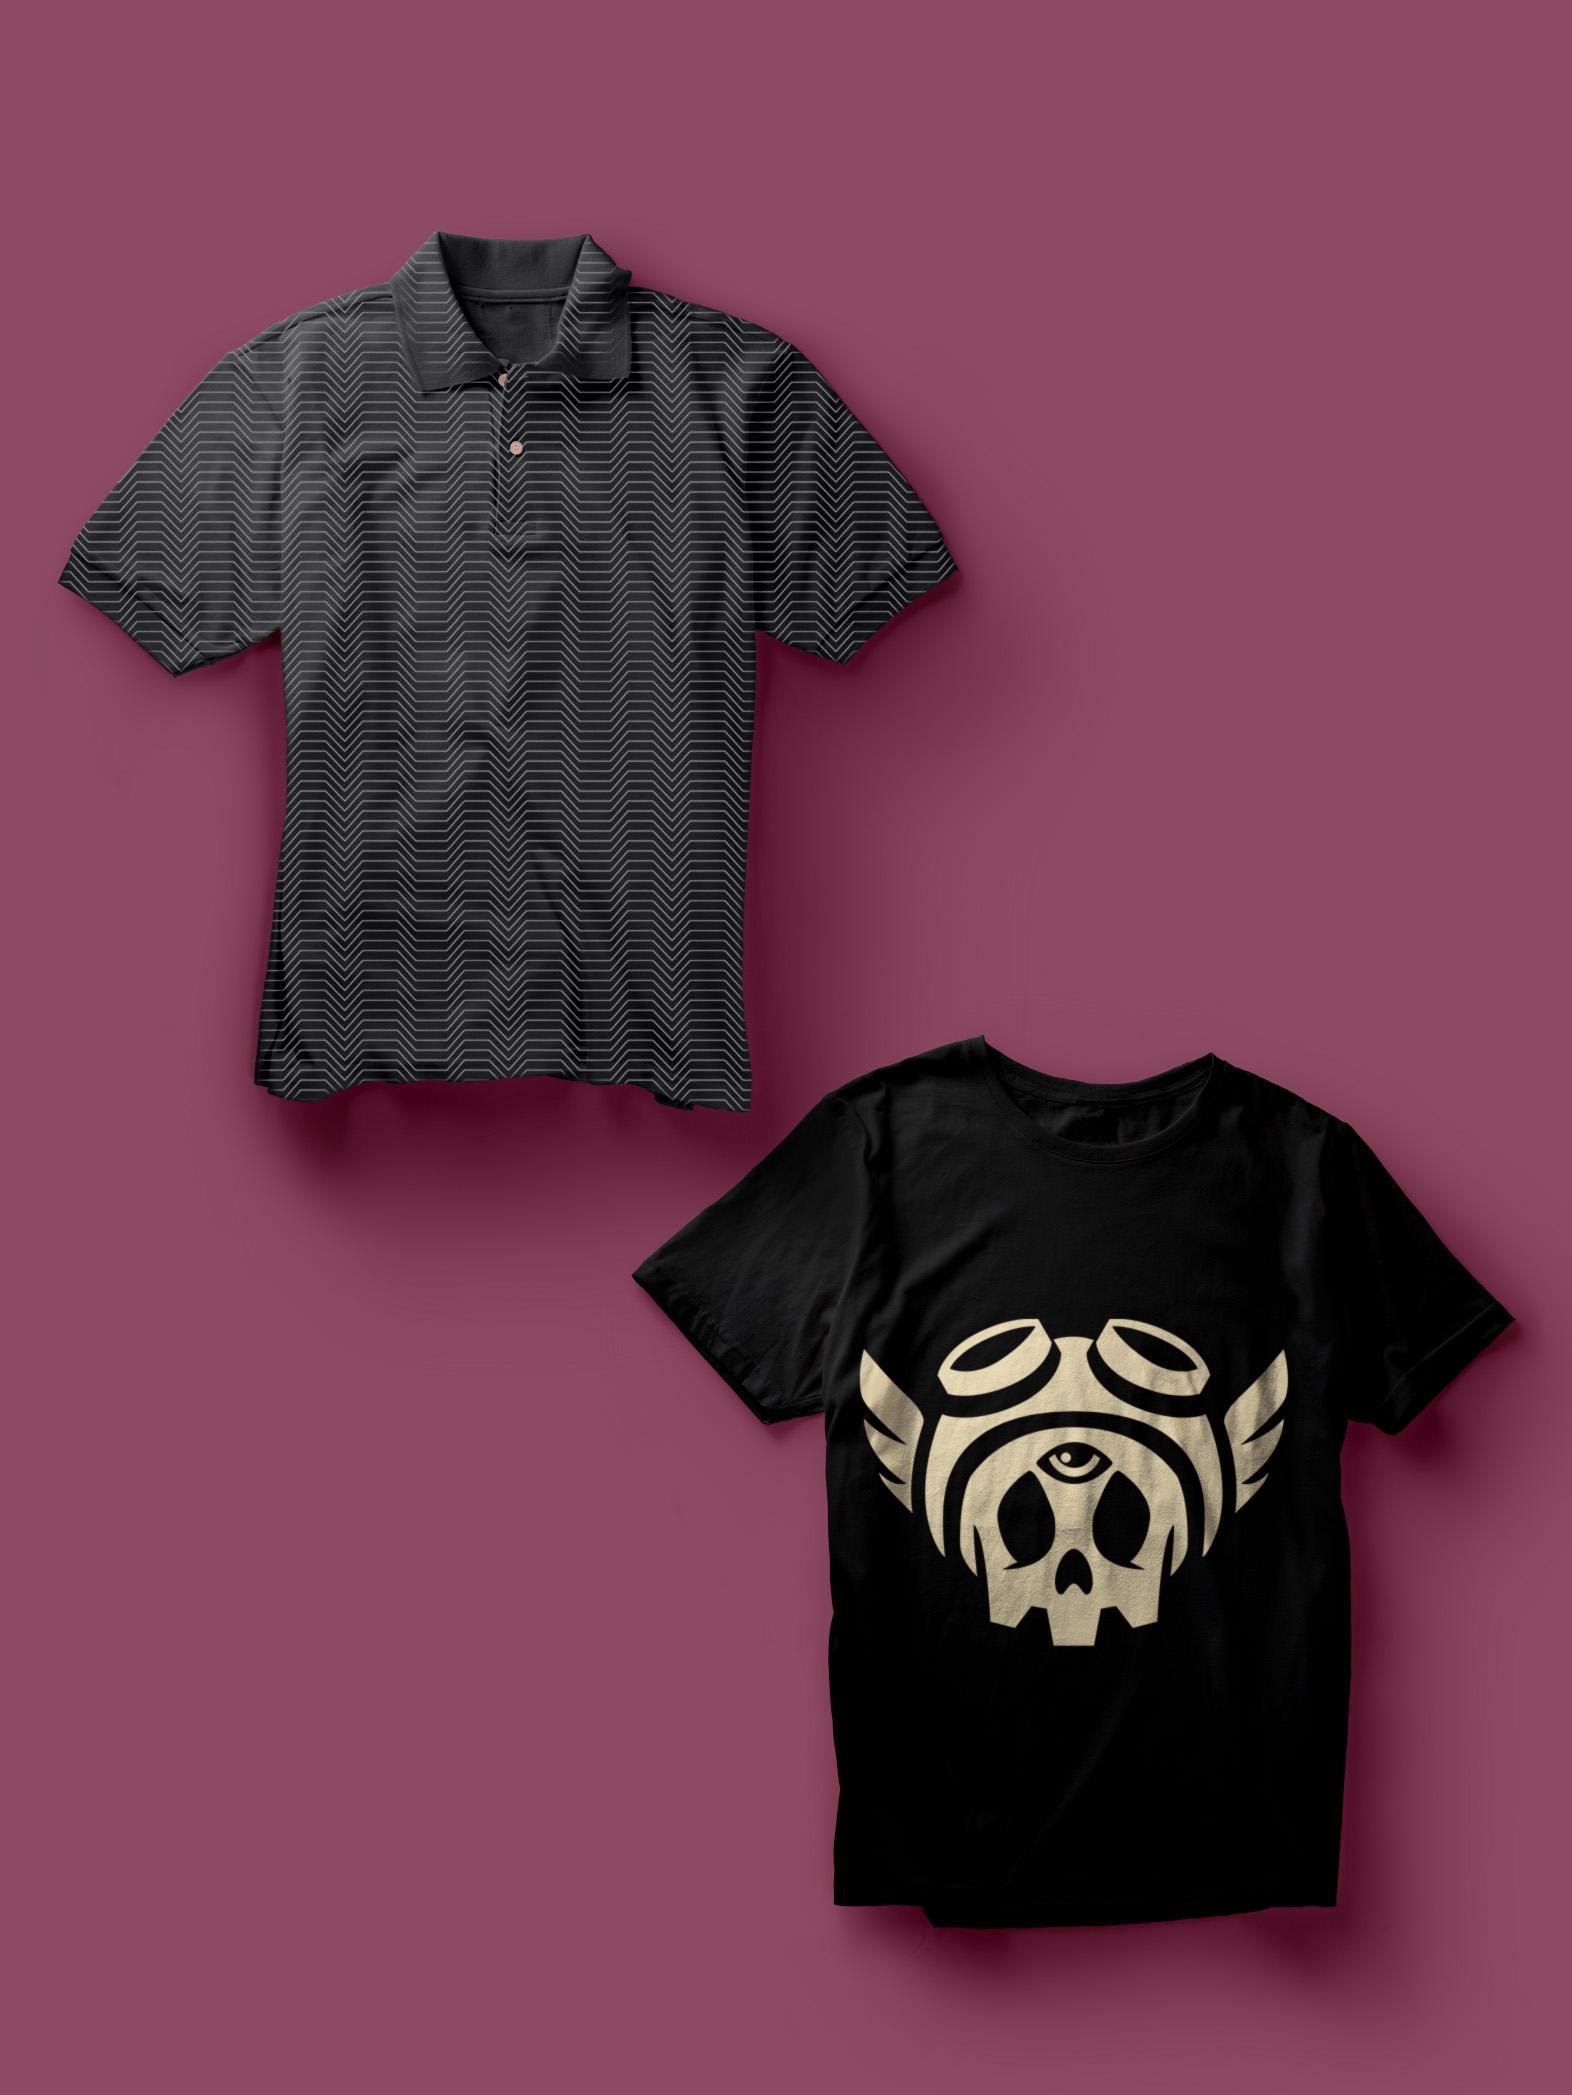 3KMKZ Shirts2.jpg